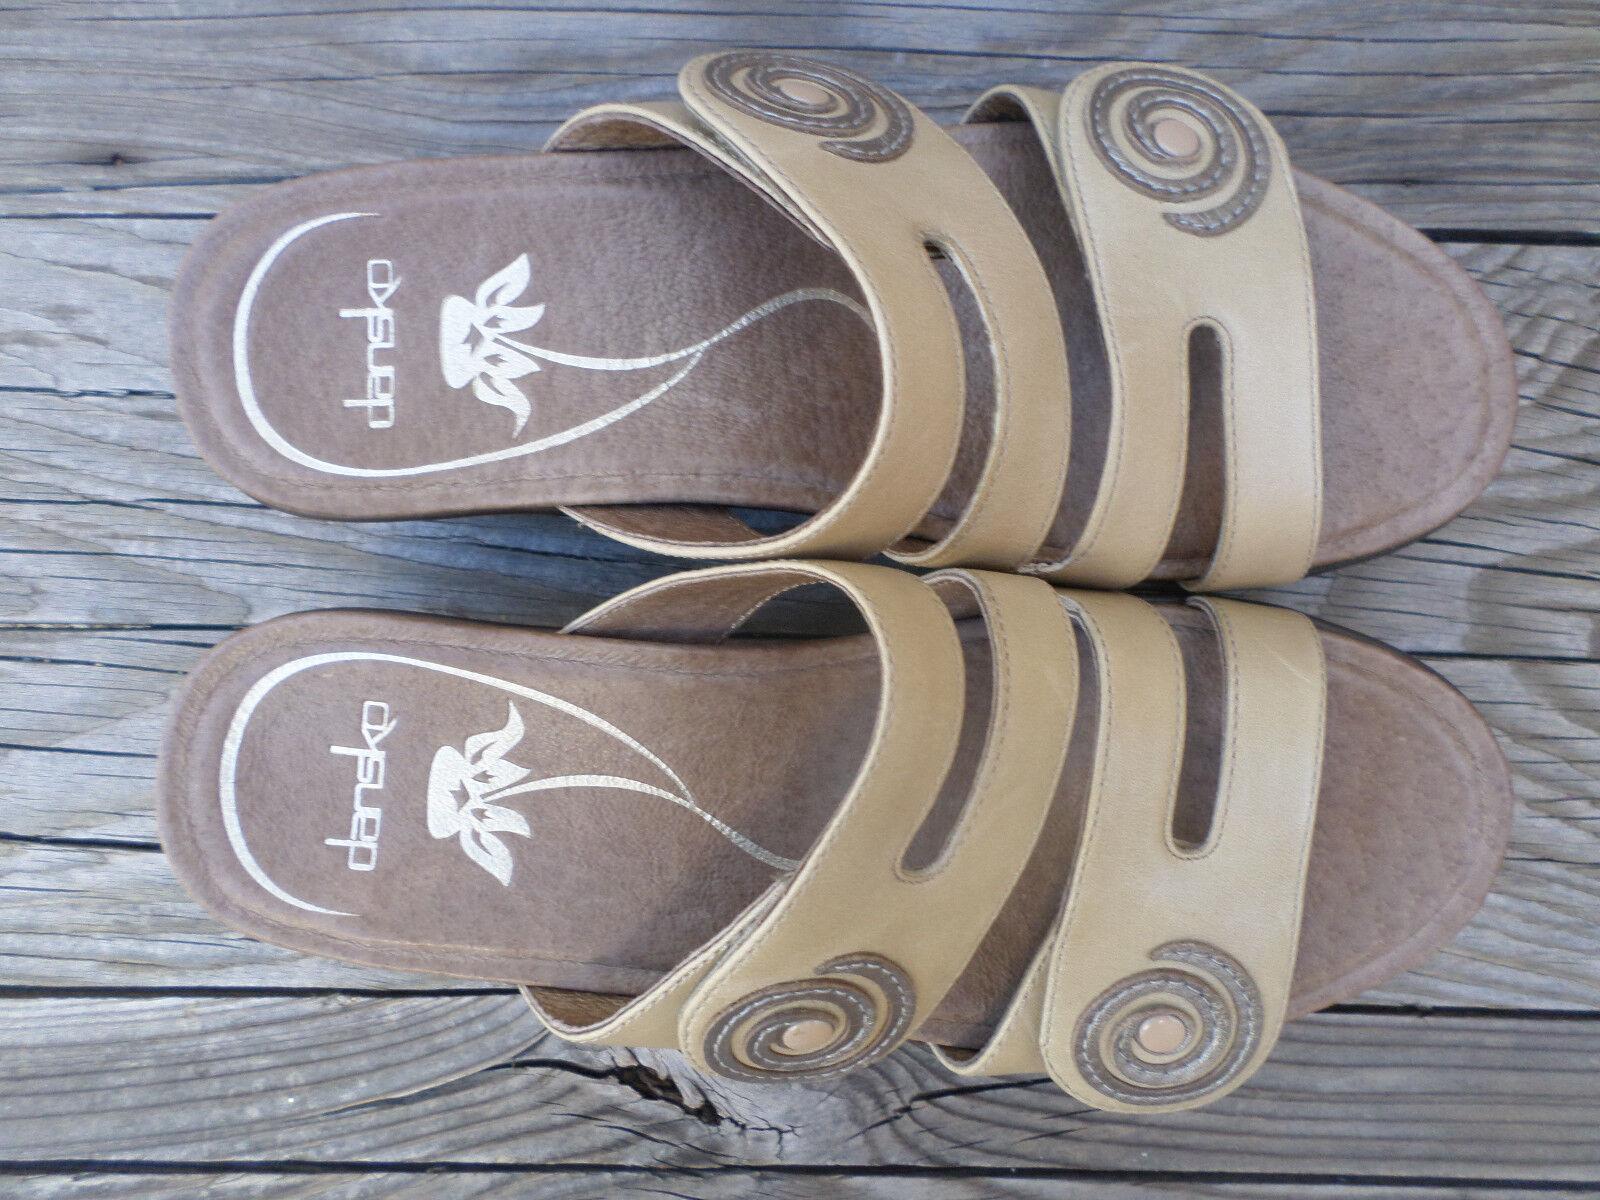 Dansko Tan Leather Sandals Donna  37      6.5-7 f5f92c